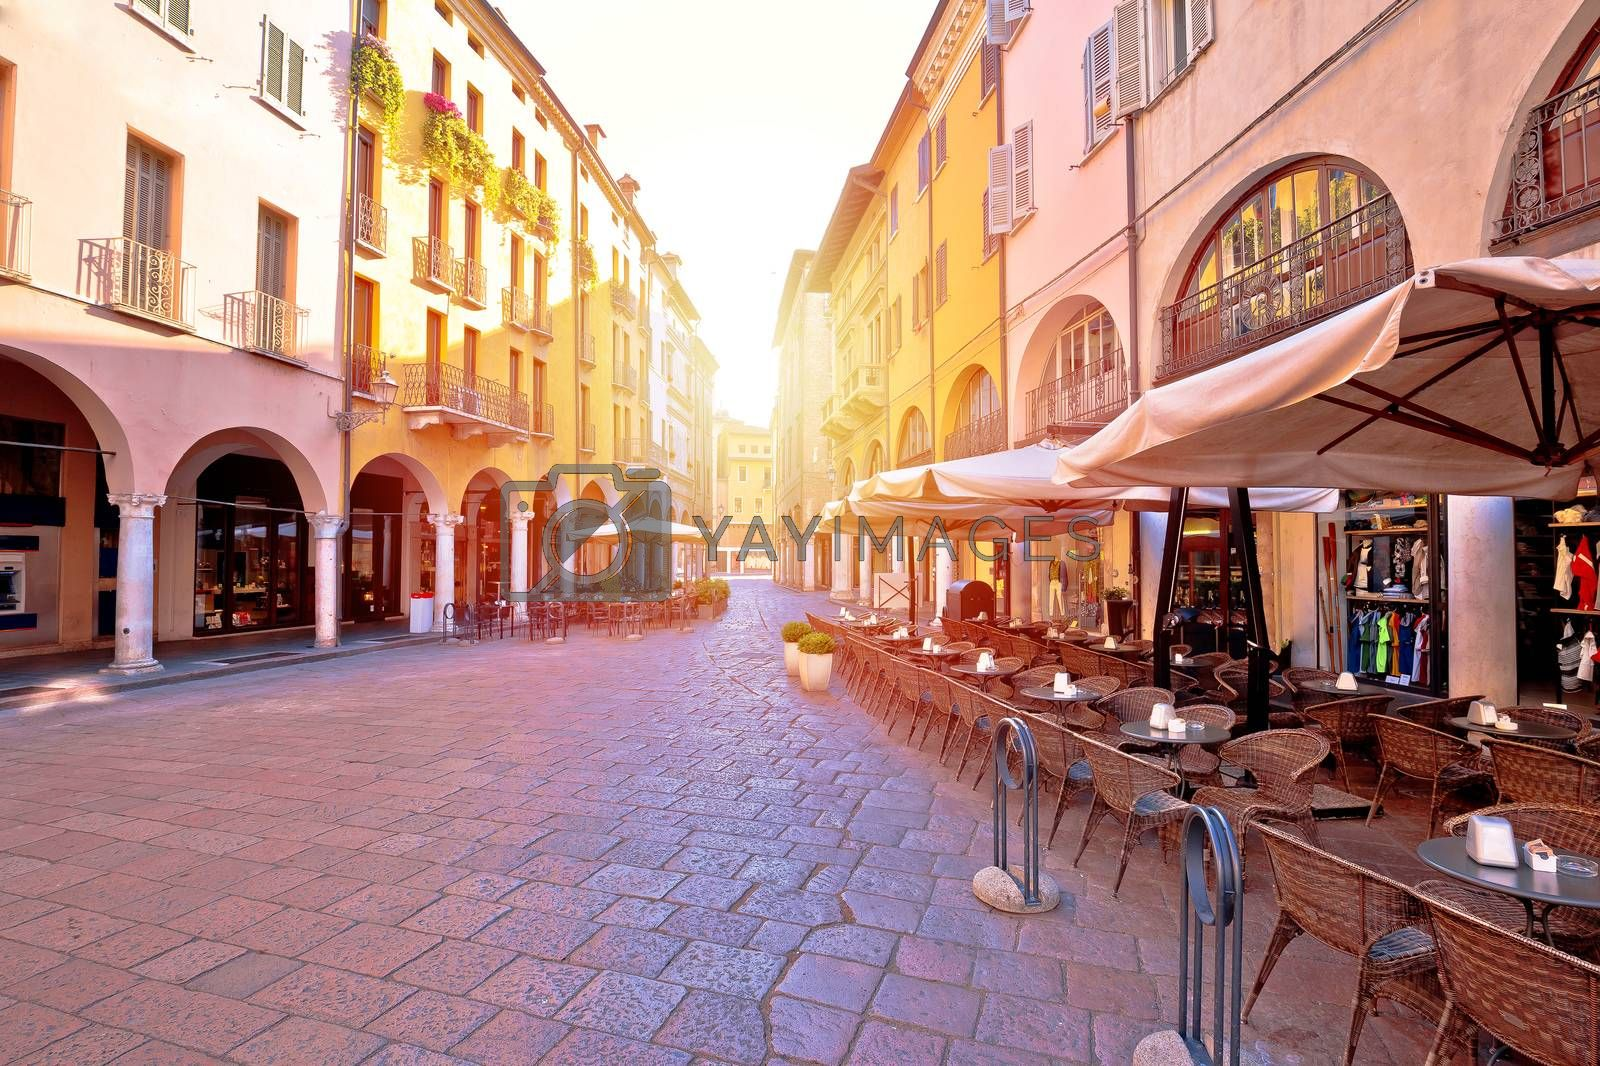 Mantova city street sun haze view, UNESCO world heritage site, Lombardy region of Italy